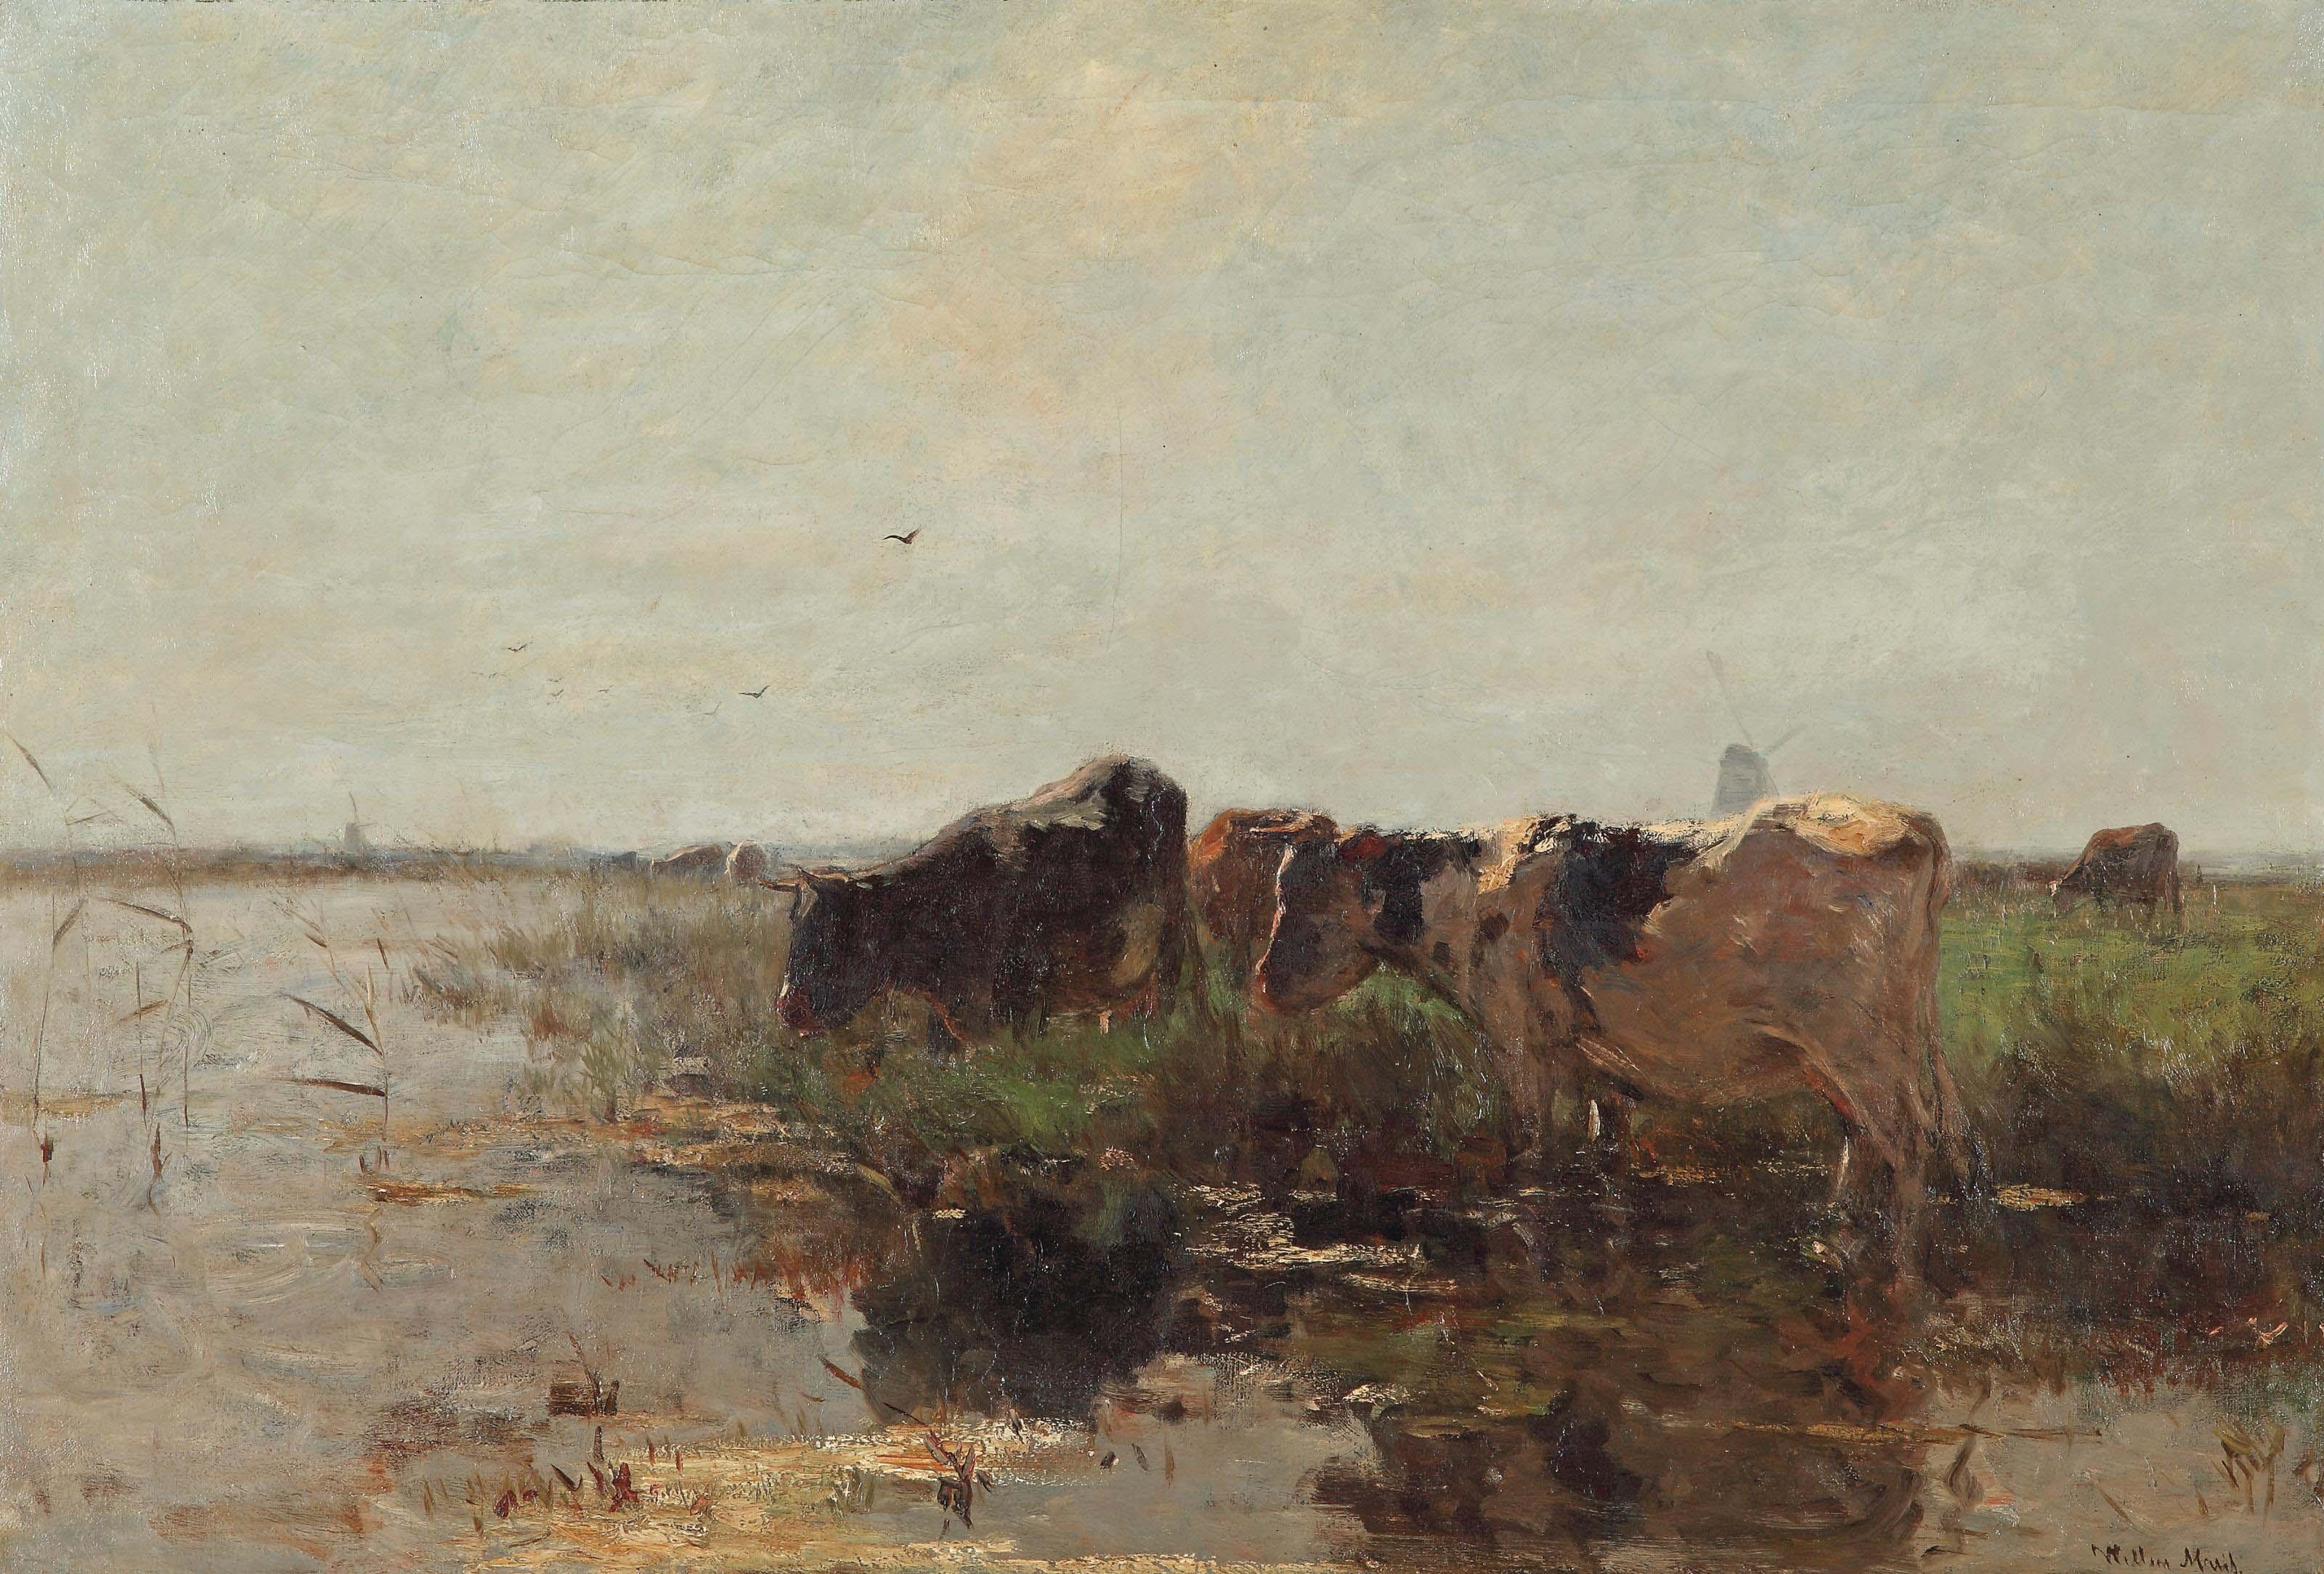 Cows grazing near a stream